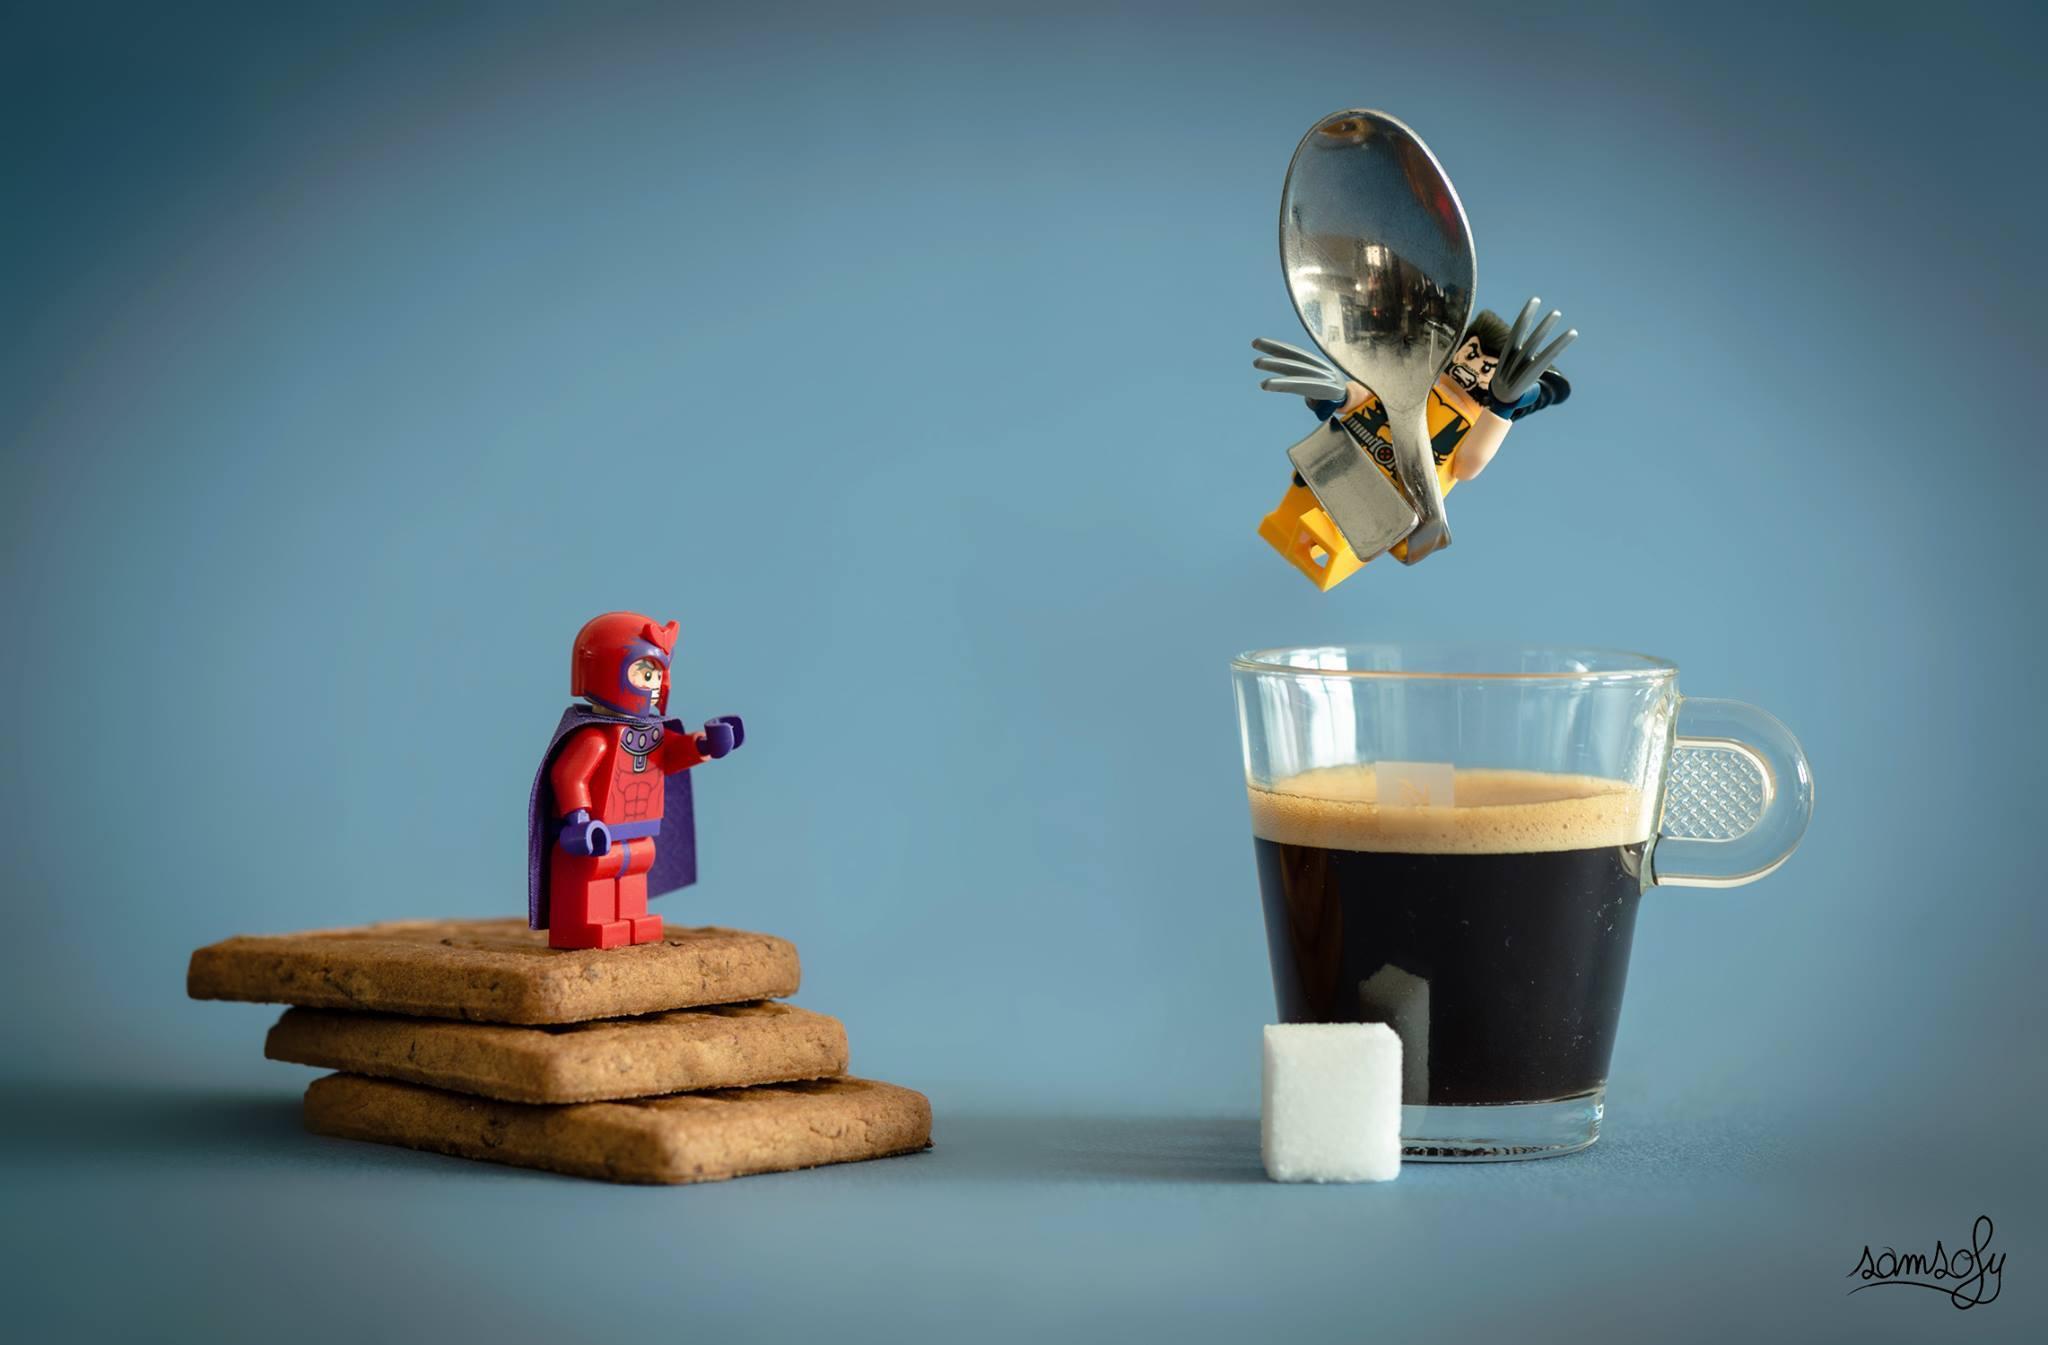 Lego Samsofy